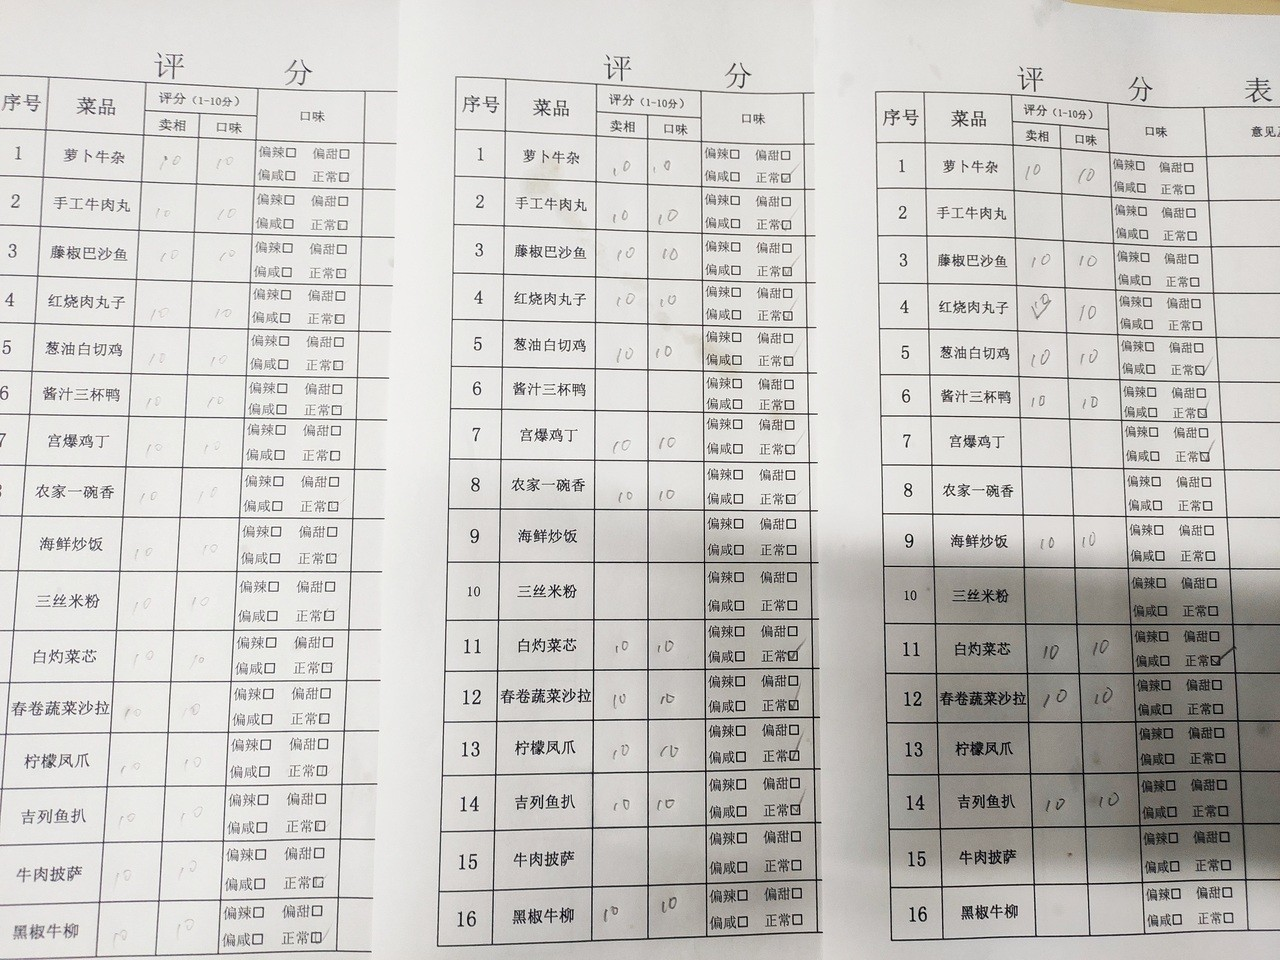 b28aeca6f242ef9be845b88ef223989.jpg